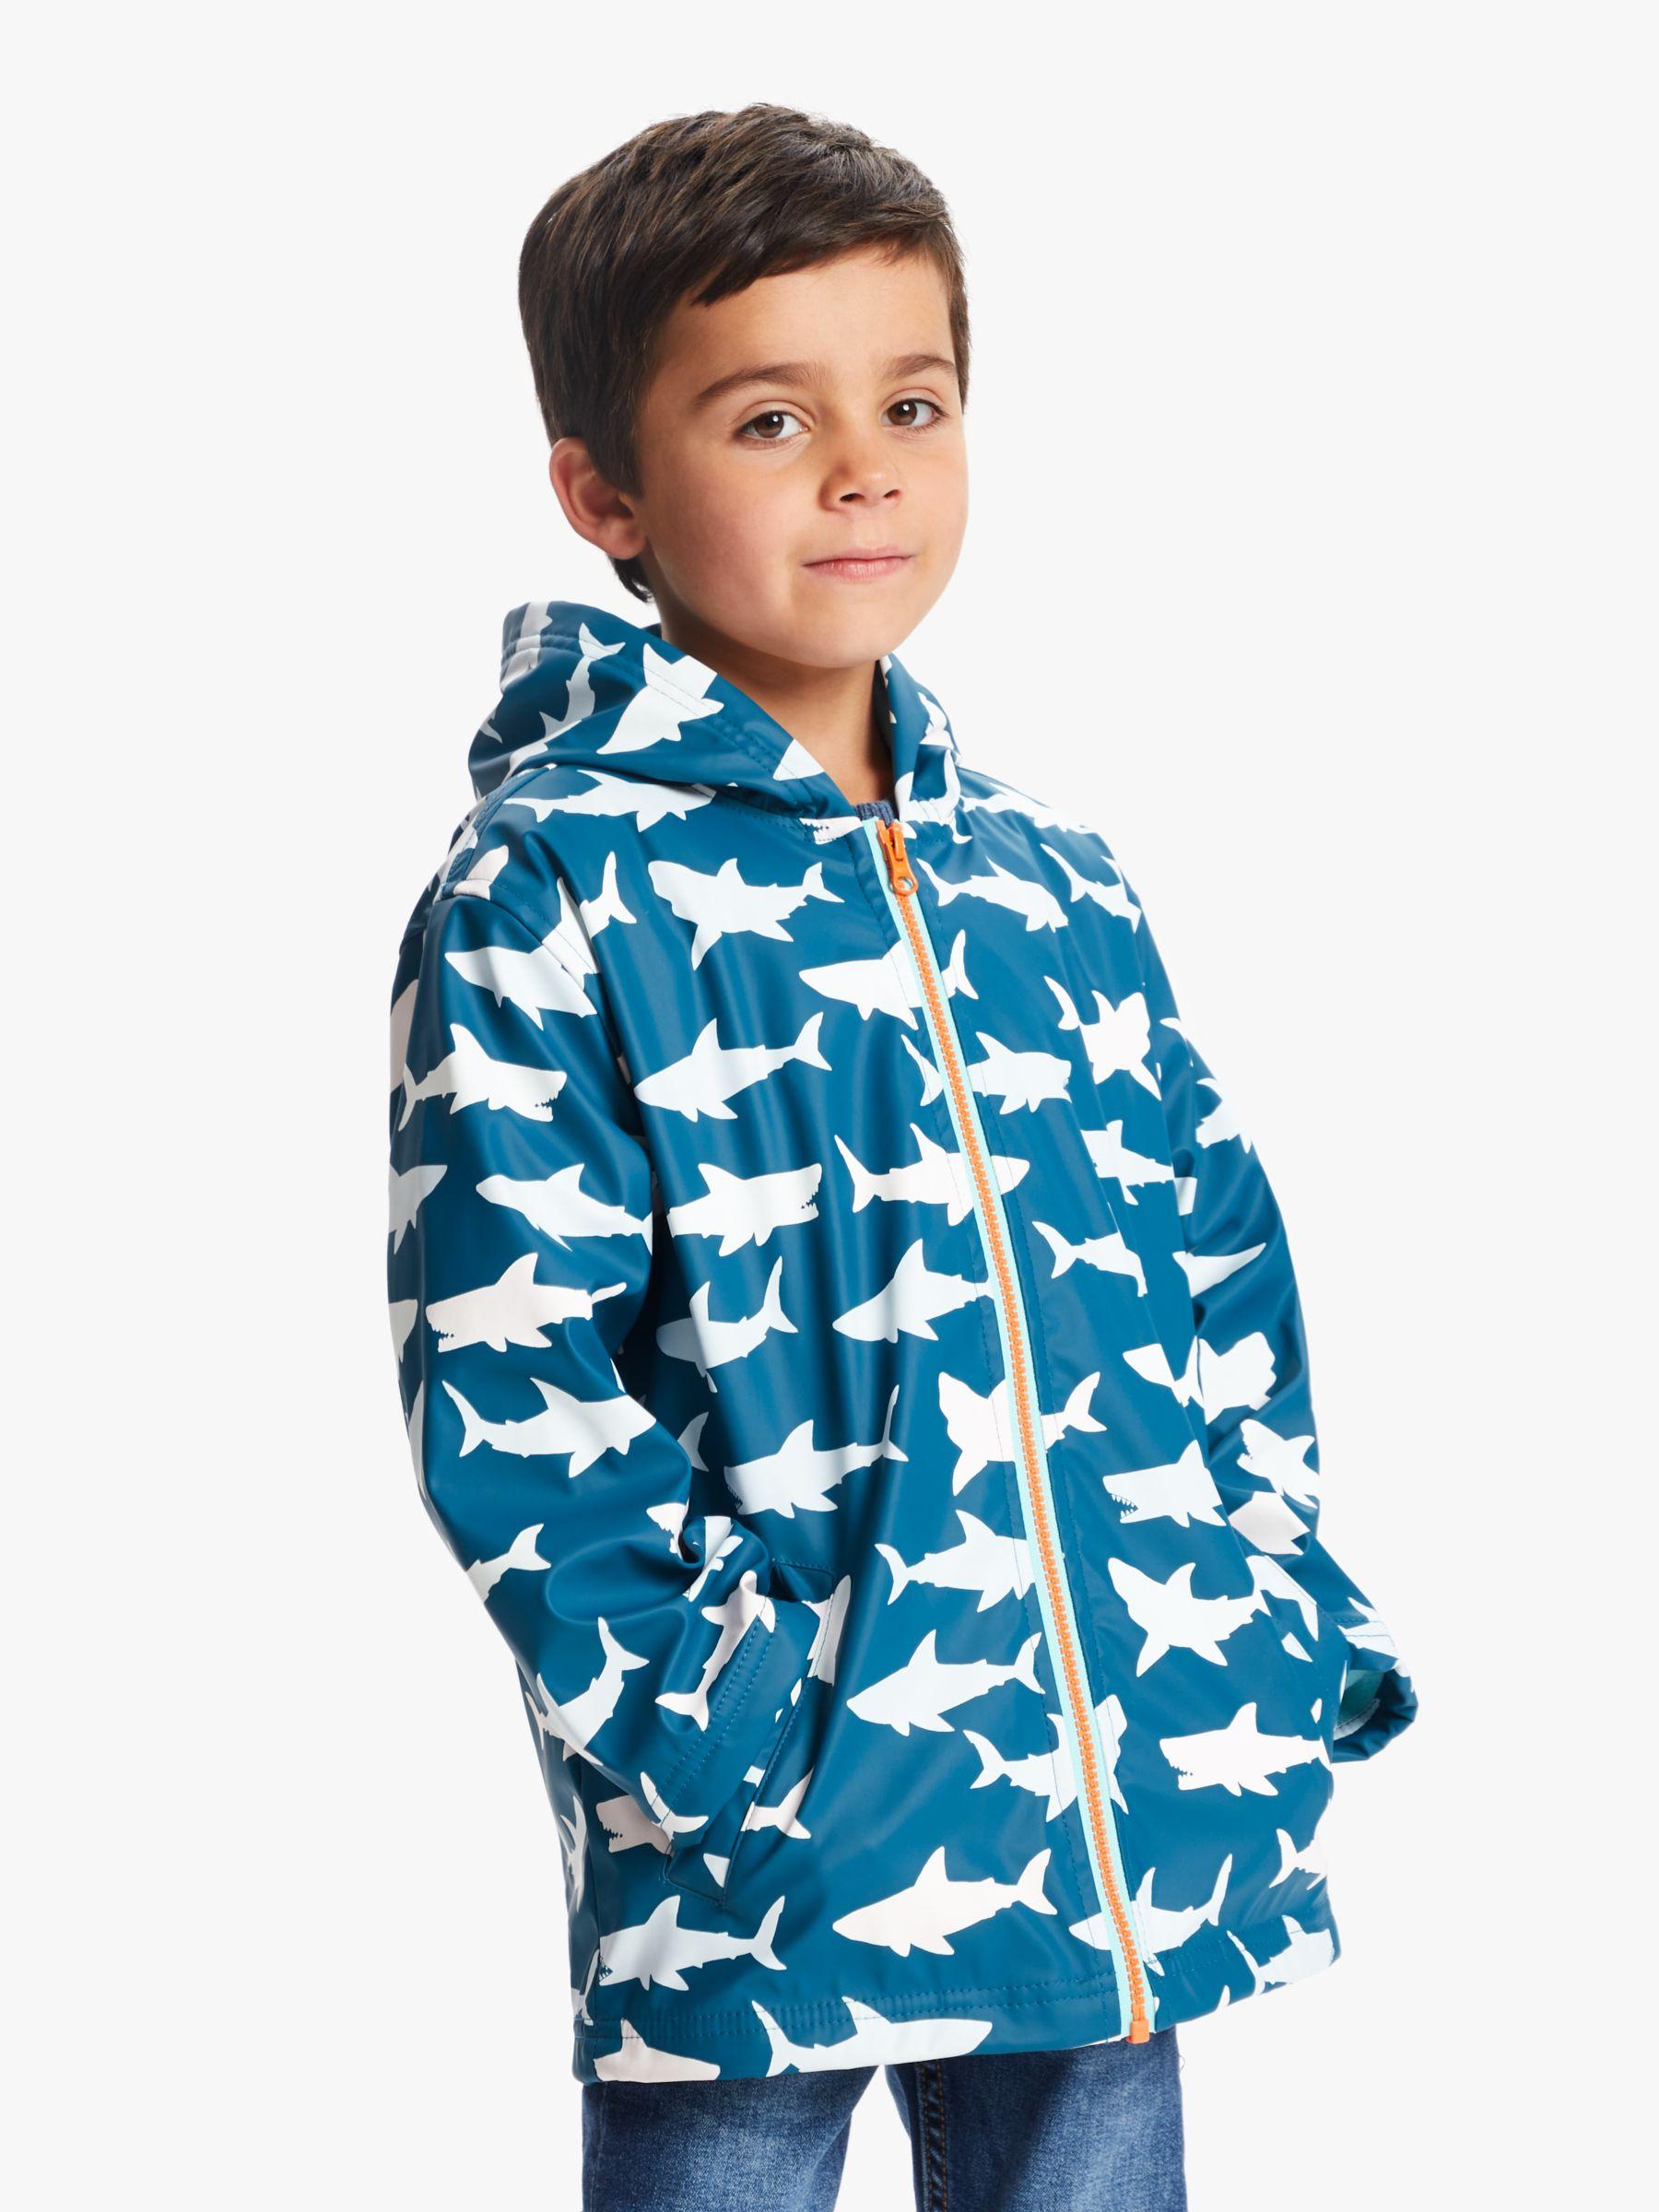 Hatley Hatley Boys' Shark Print Colour Changing Splash Jacket, Blue